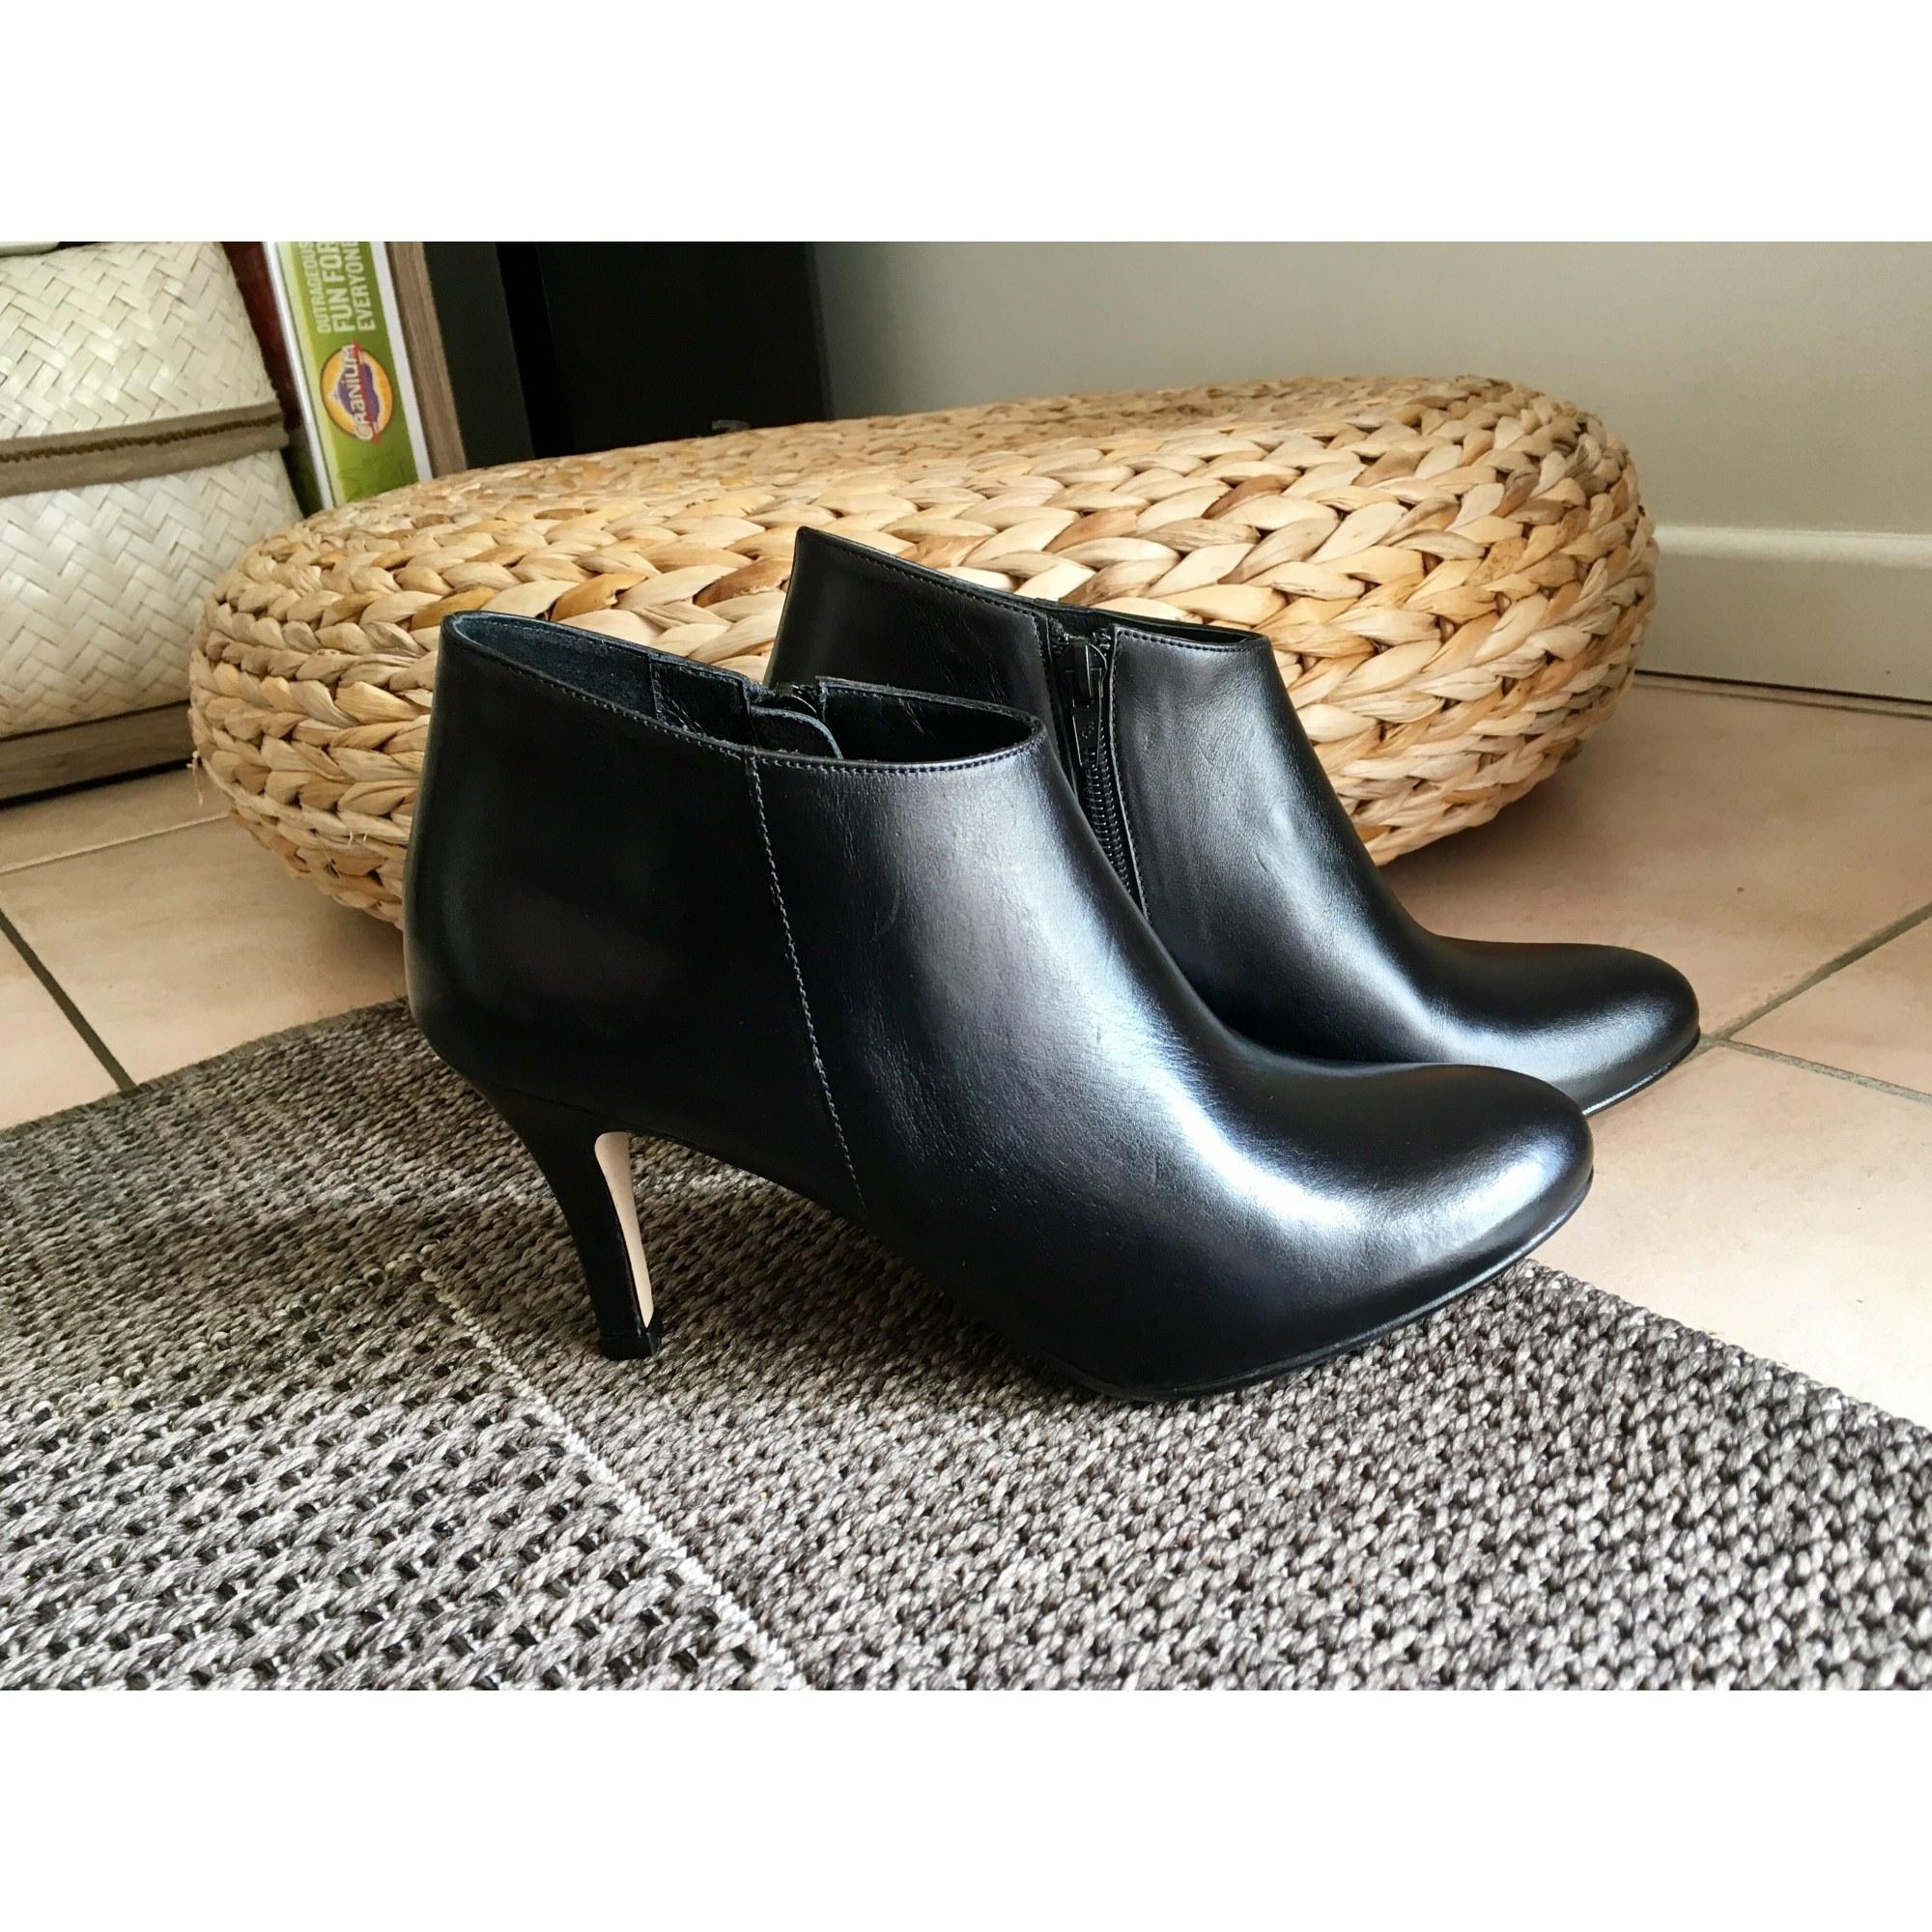 Bottineslow talons boots Bottineslow boots à 80mwNn